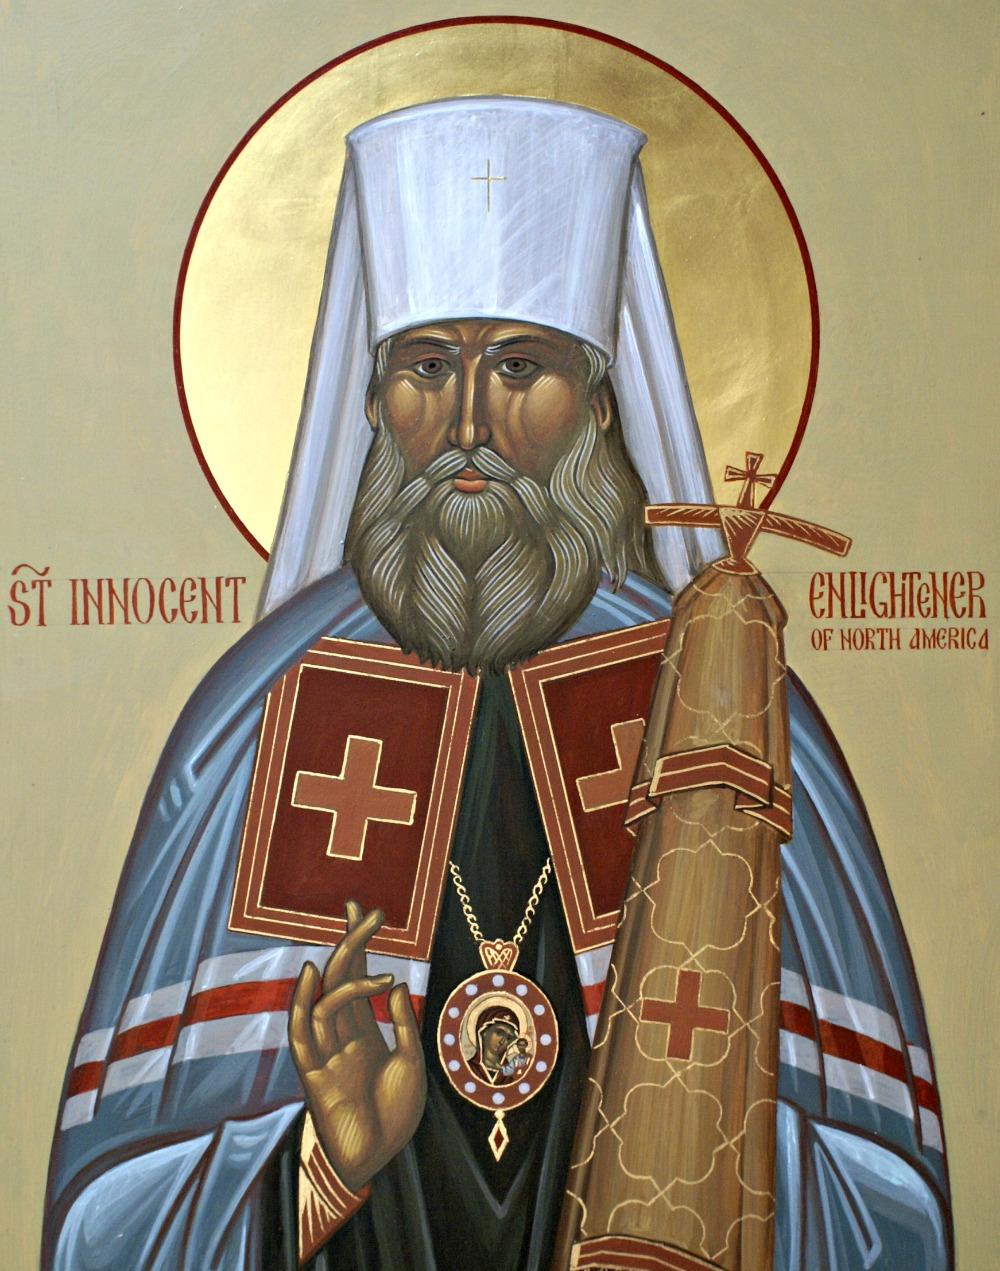 Saint Innocent, Enlightener of North America